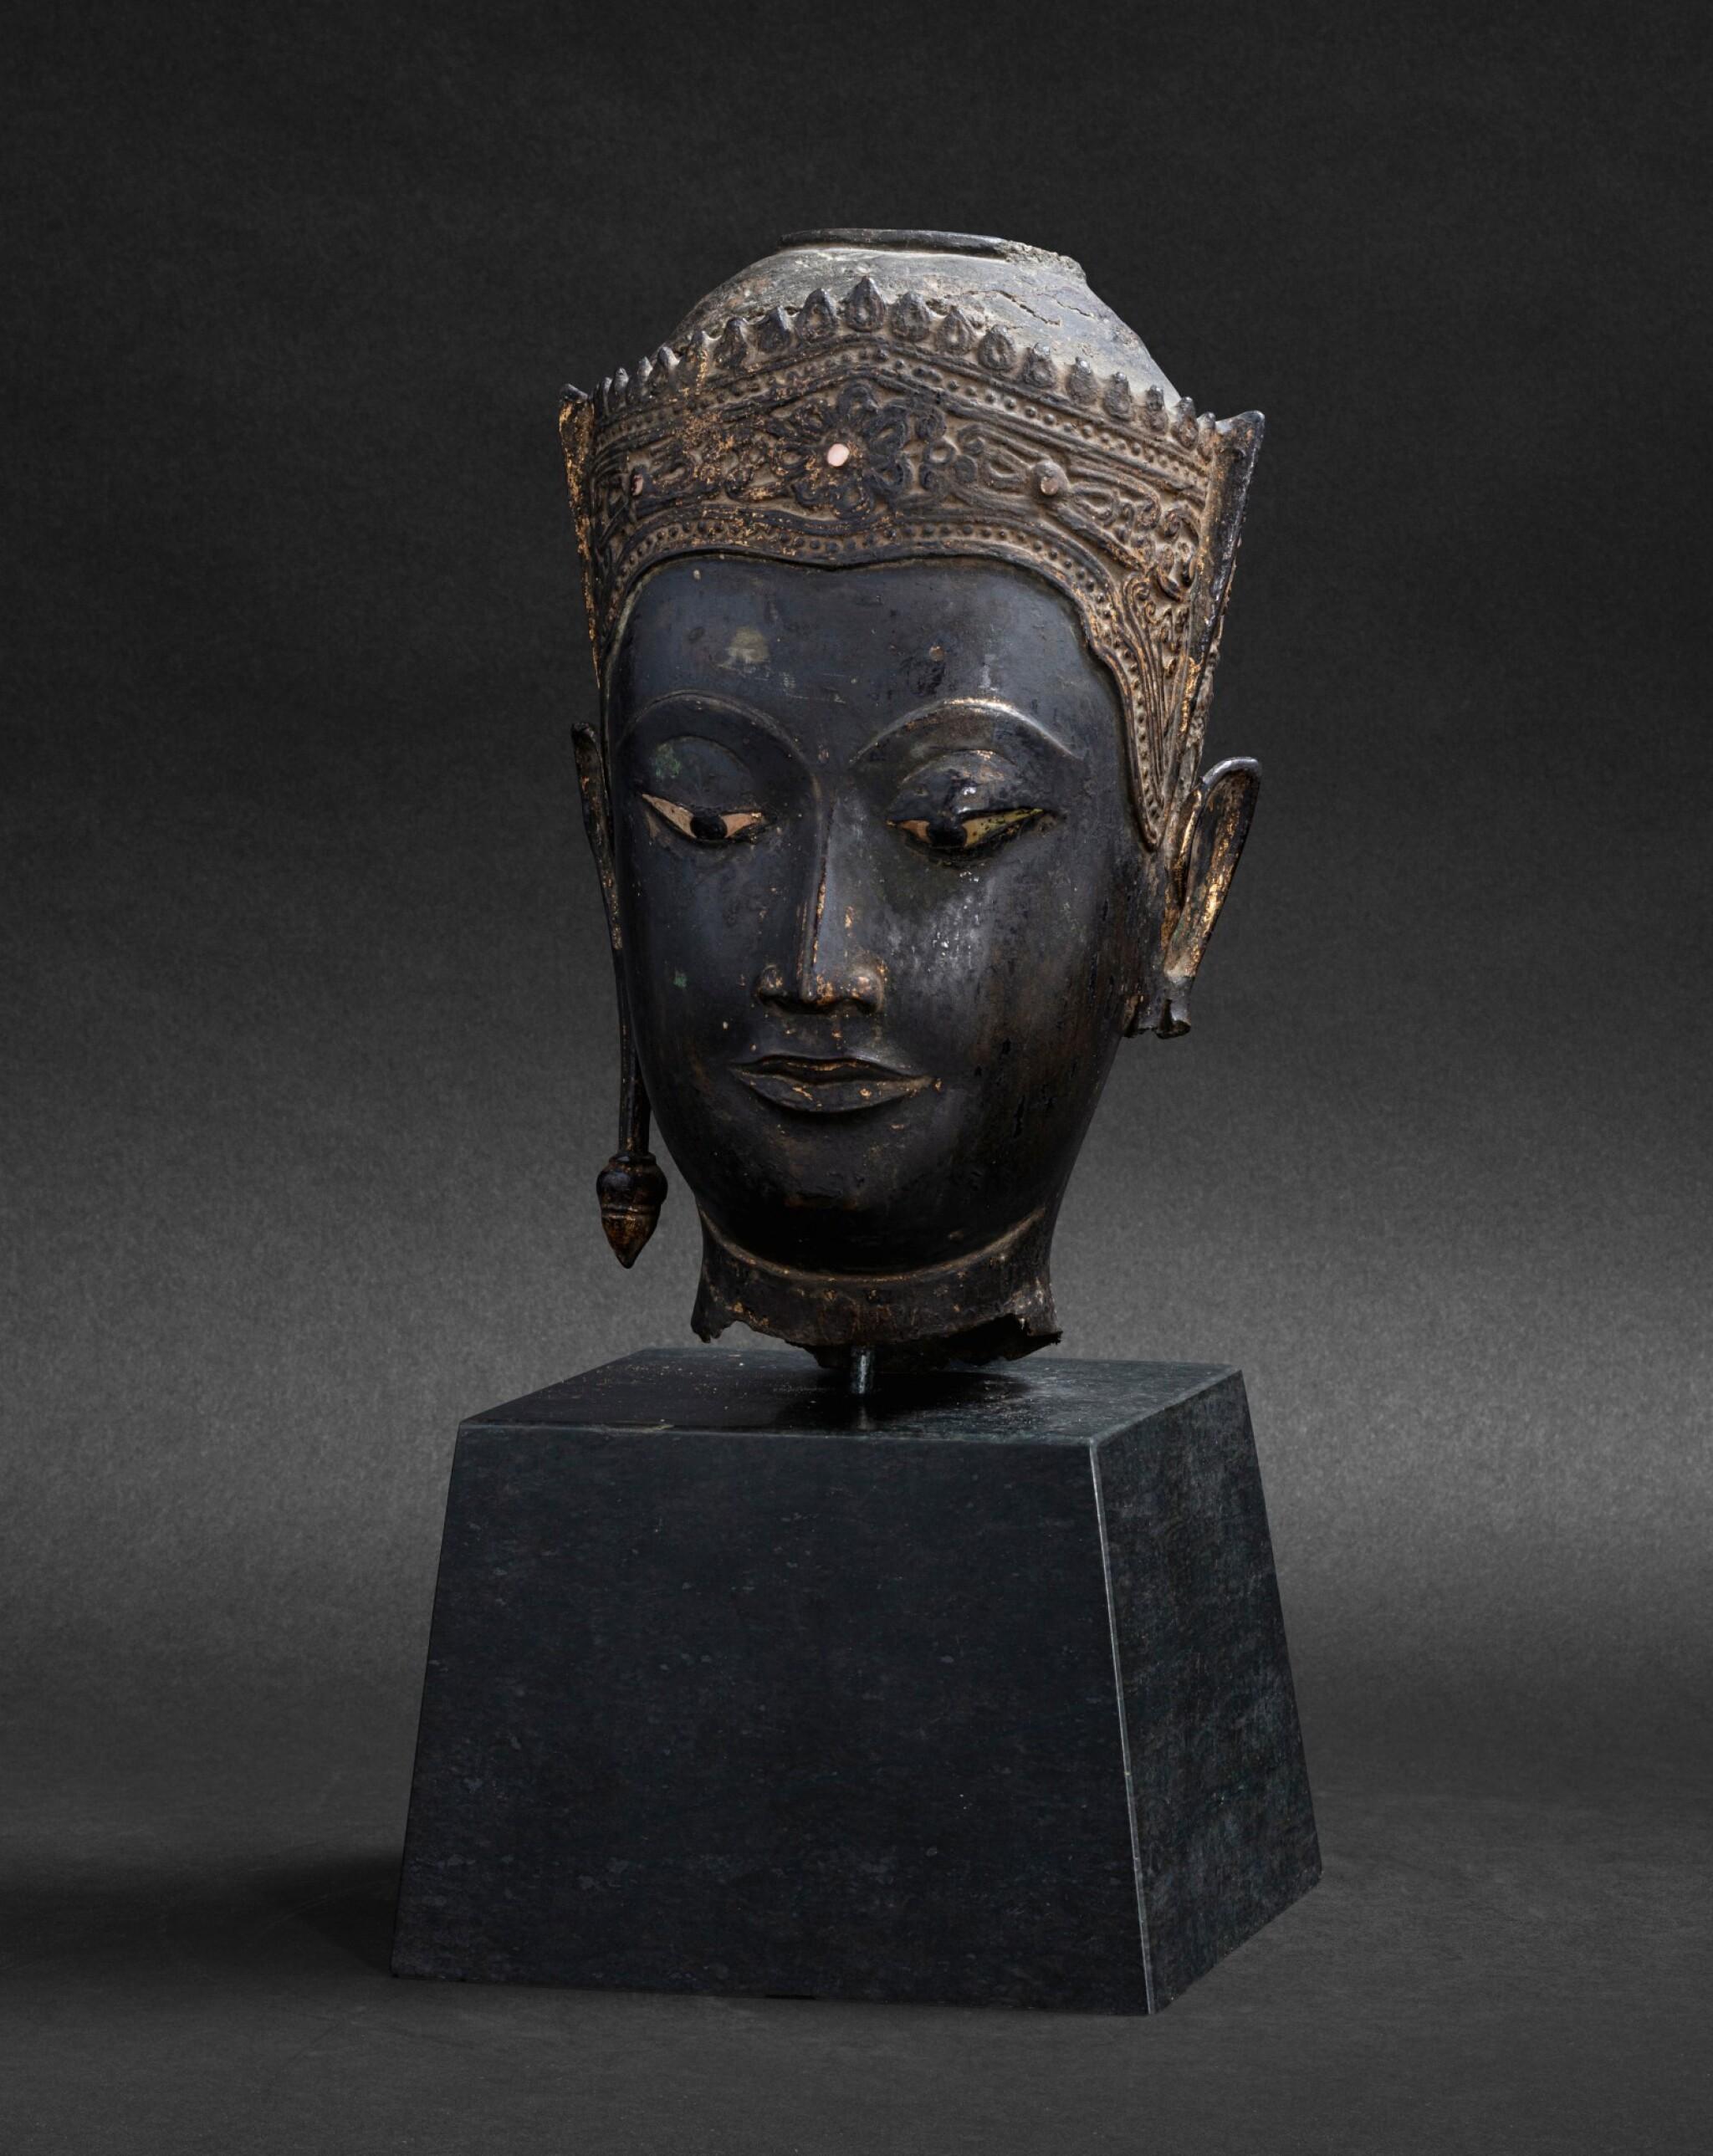 View 1 of Lot 98. Tête en bronze doré Thaïlande, style Ayutthaya, XVIE-XVIIE siècle | 暹邏 十六至十七世紀 銅阿瑜陀耶式佛首 | A gilt-bronze head, Thailand, Ayutthaya style, 16th-17th century.